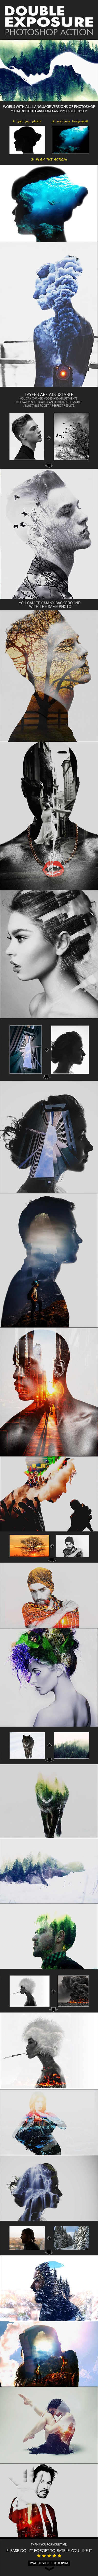 Double Exposure Photoshop Action - Actions Photoshop